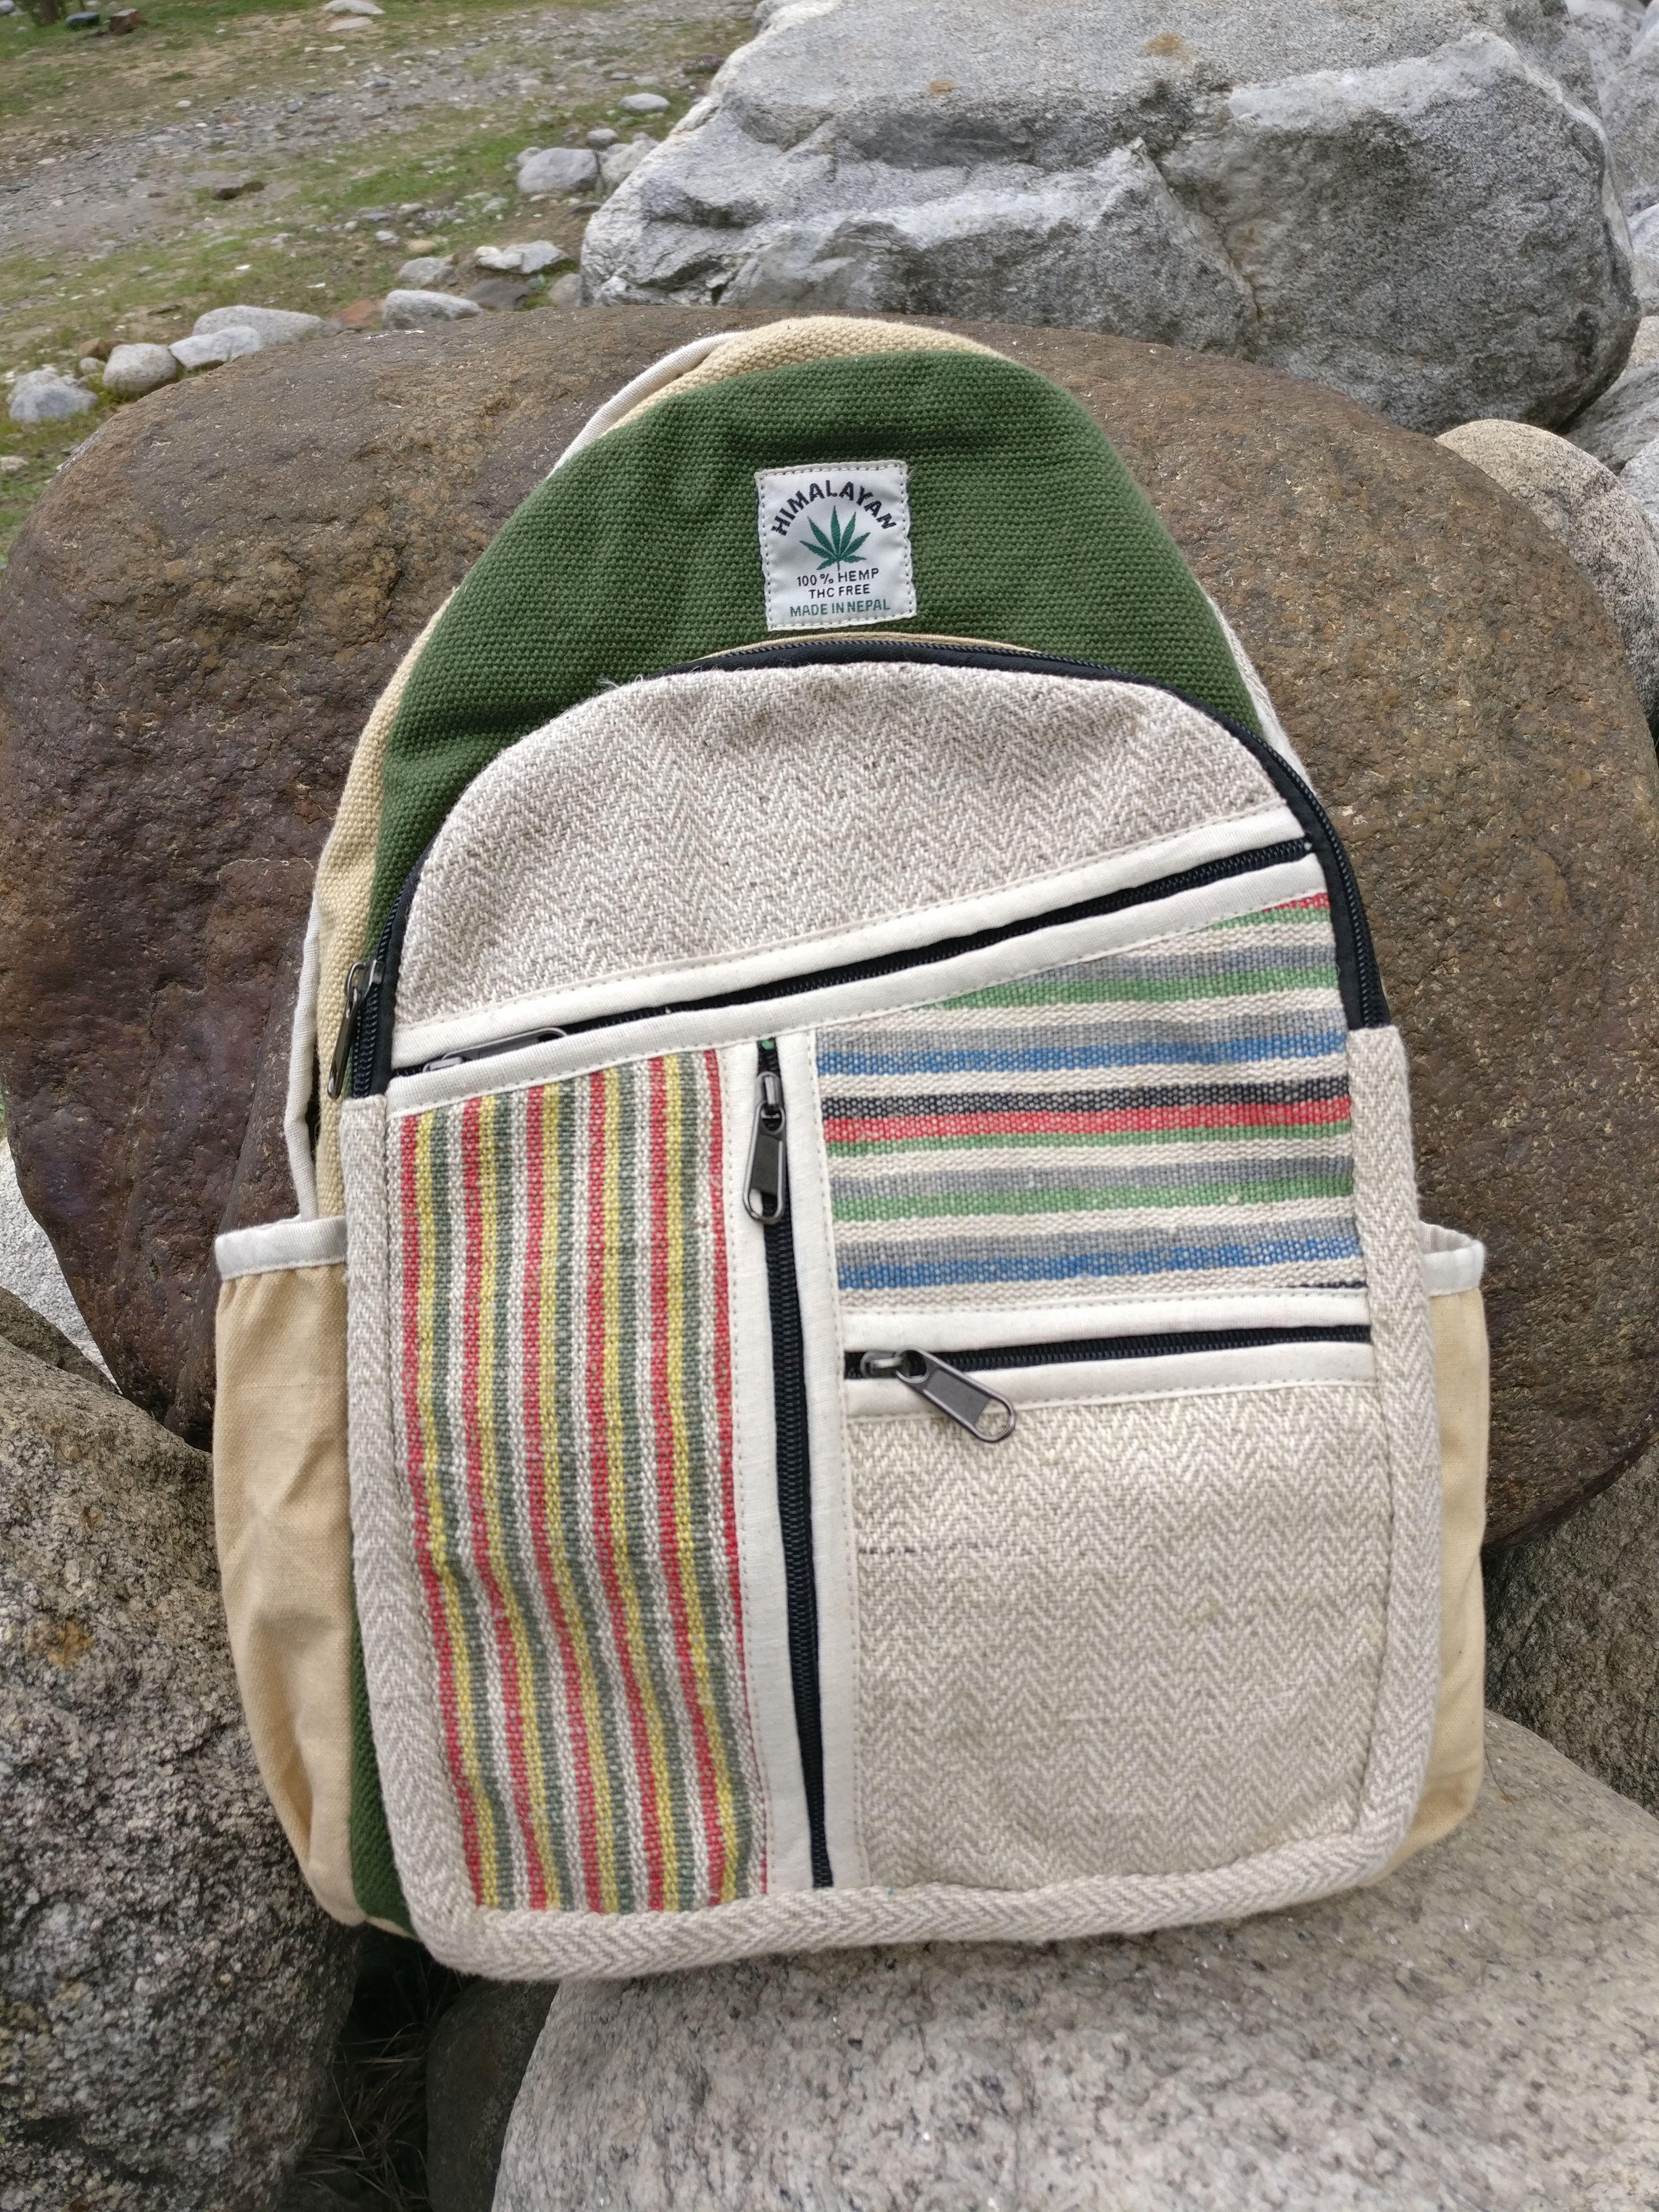 e50185cb24c2 Himalayan hemp bag with warm colours Unique backpack 100% organic fabric bag   handmade Environment friendly hemp fabric  hempfashion